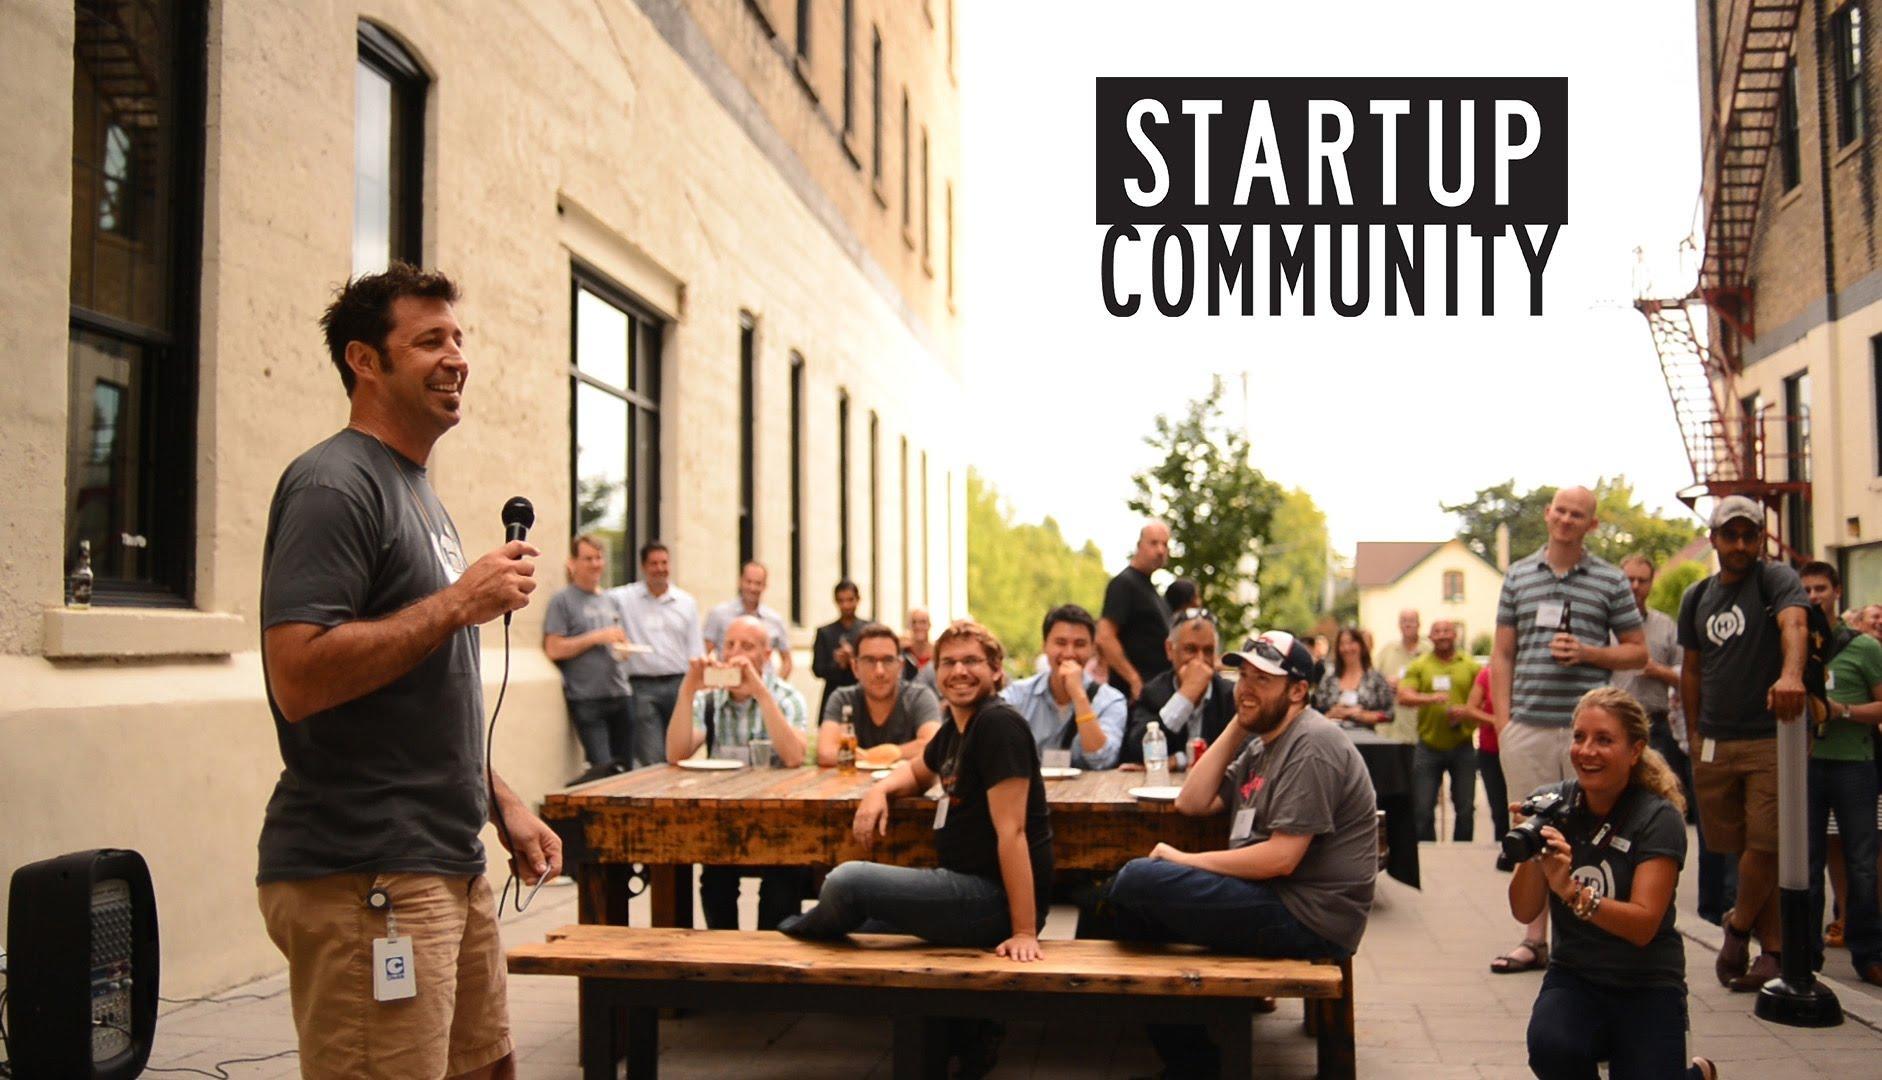 Startup Film Series Featuring: Startup Commun